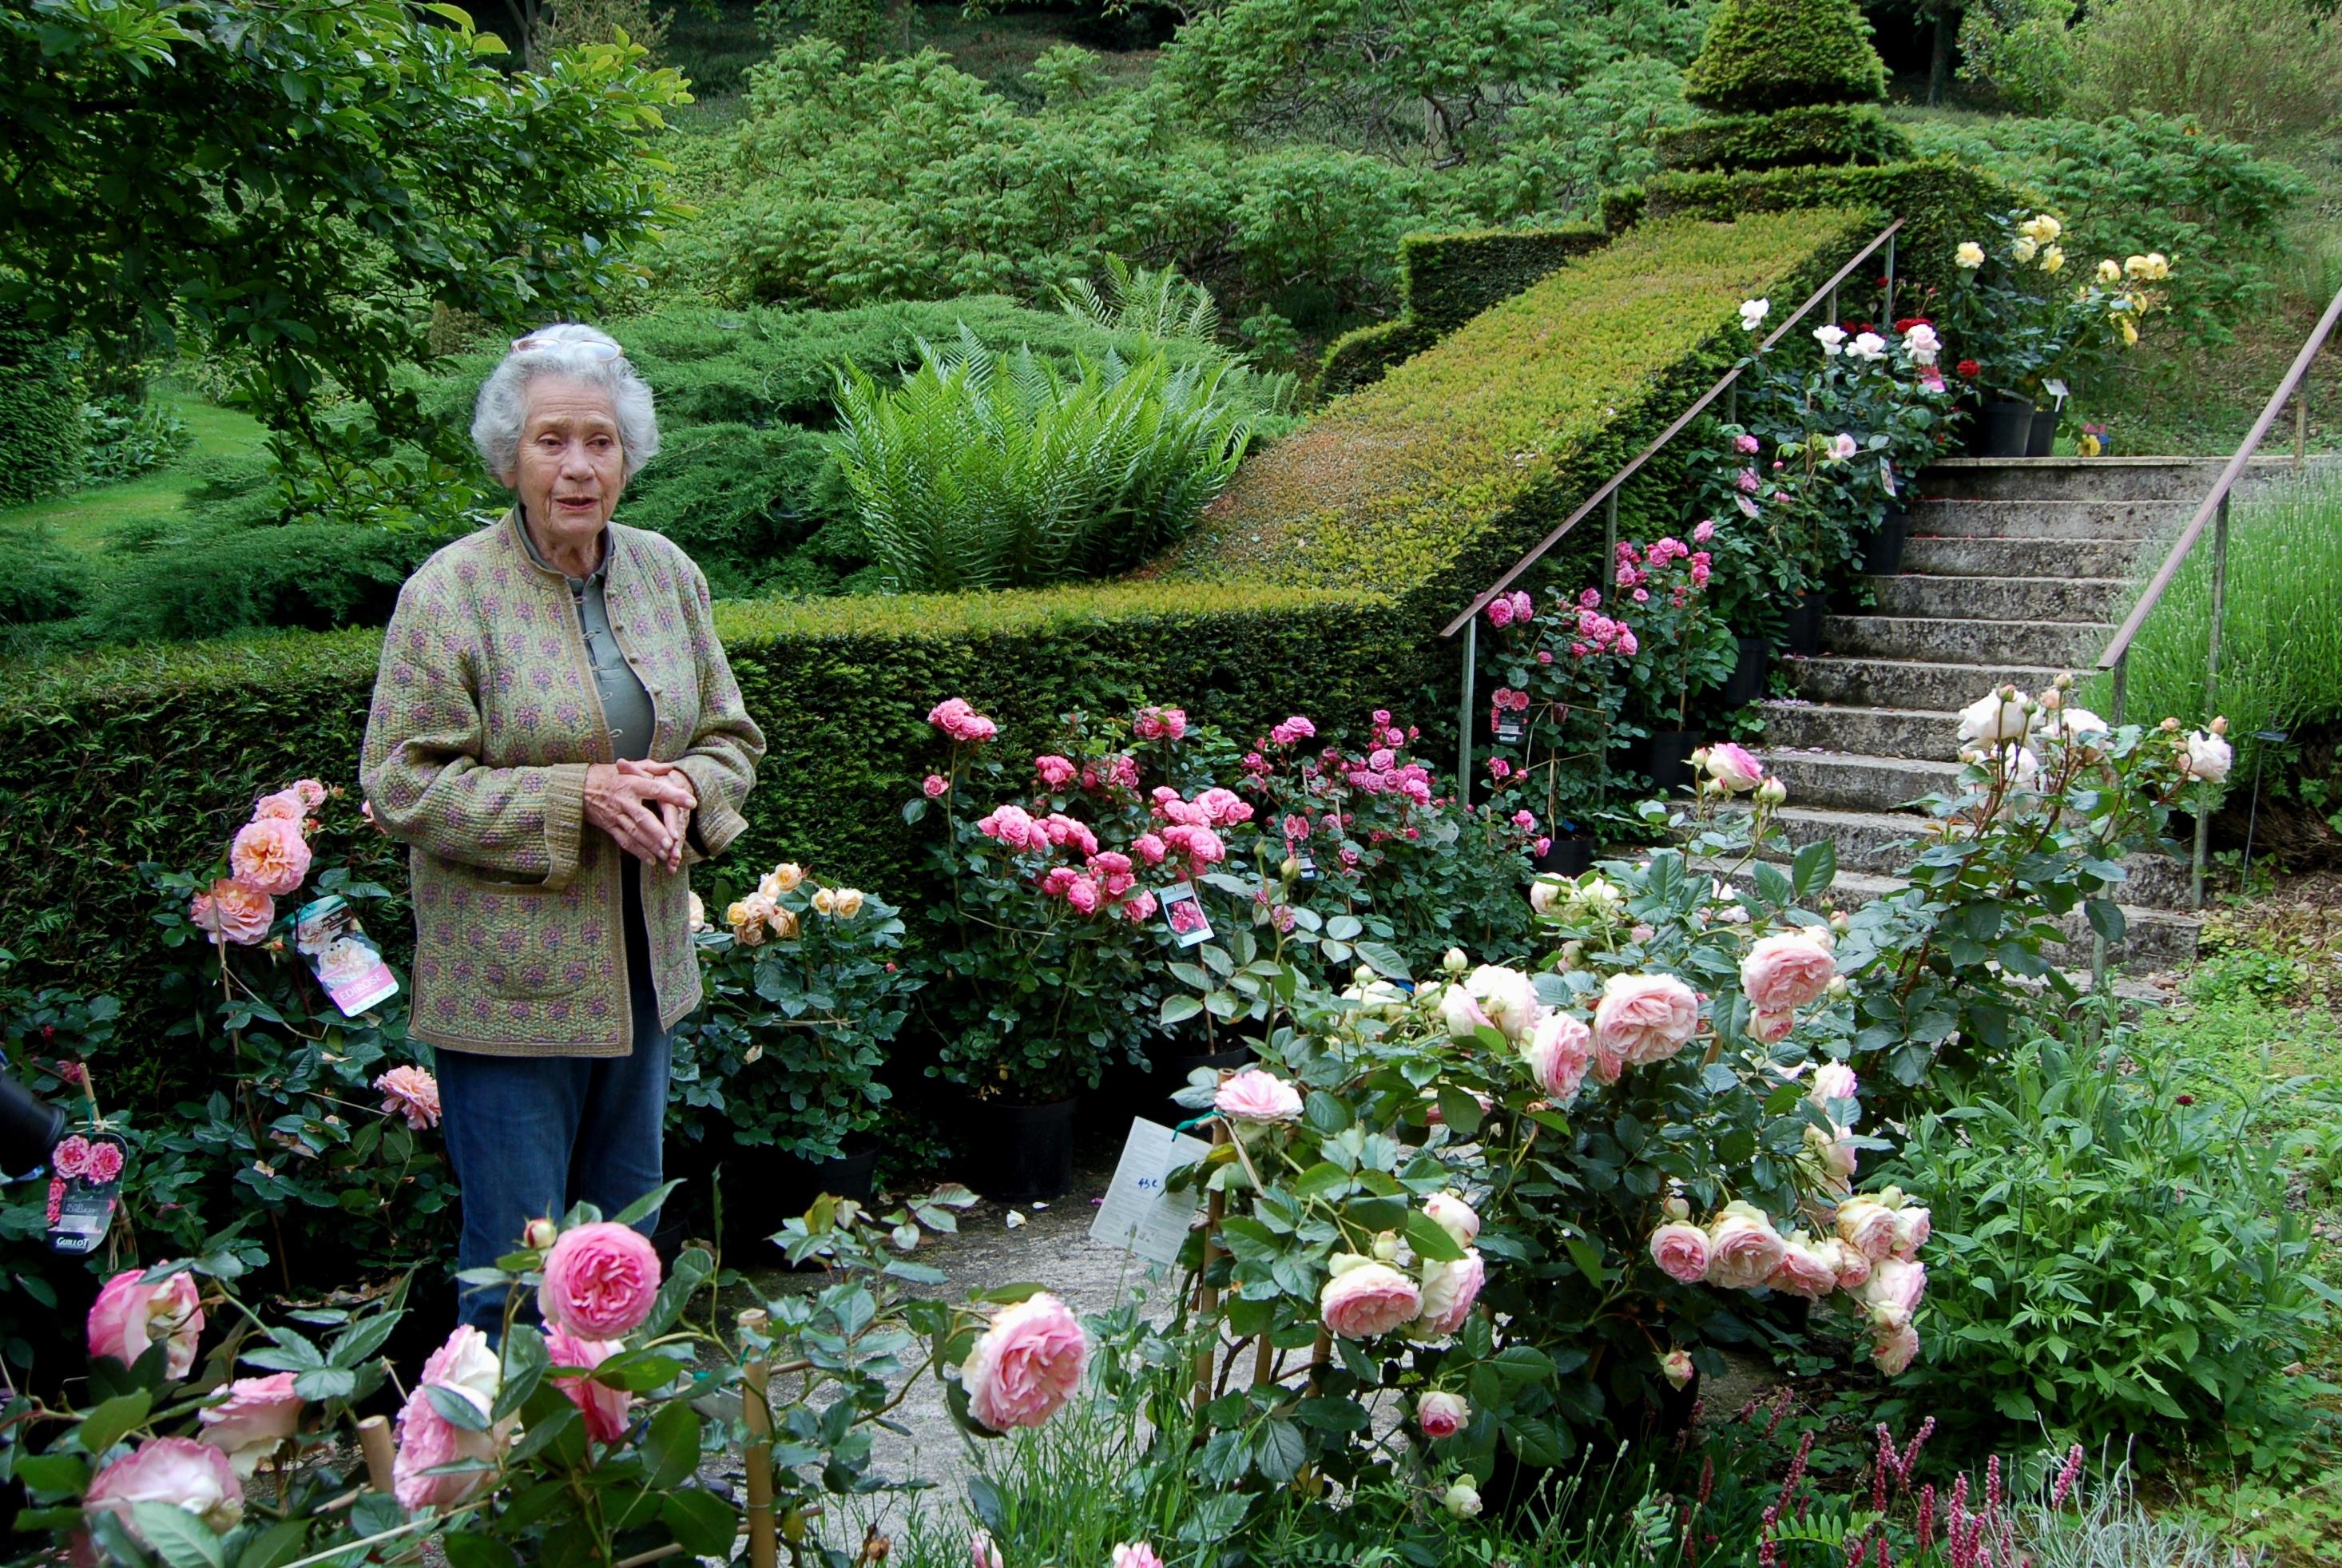 Les jardin du plessis sasnieres hortitopia for Garden jardin